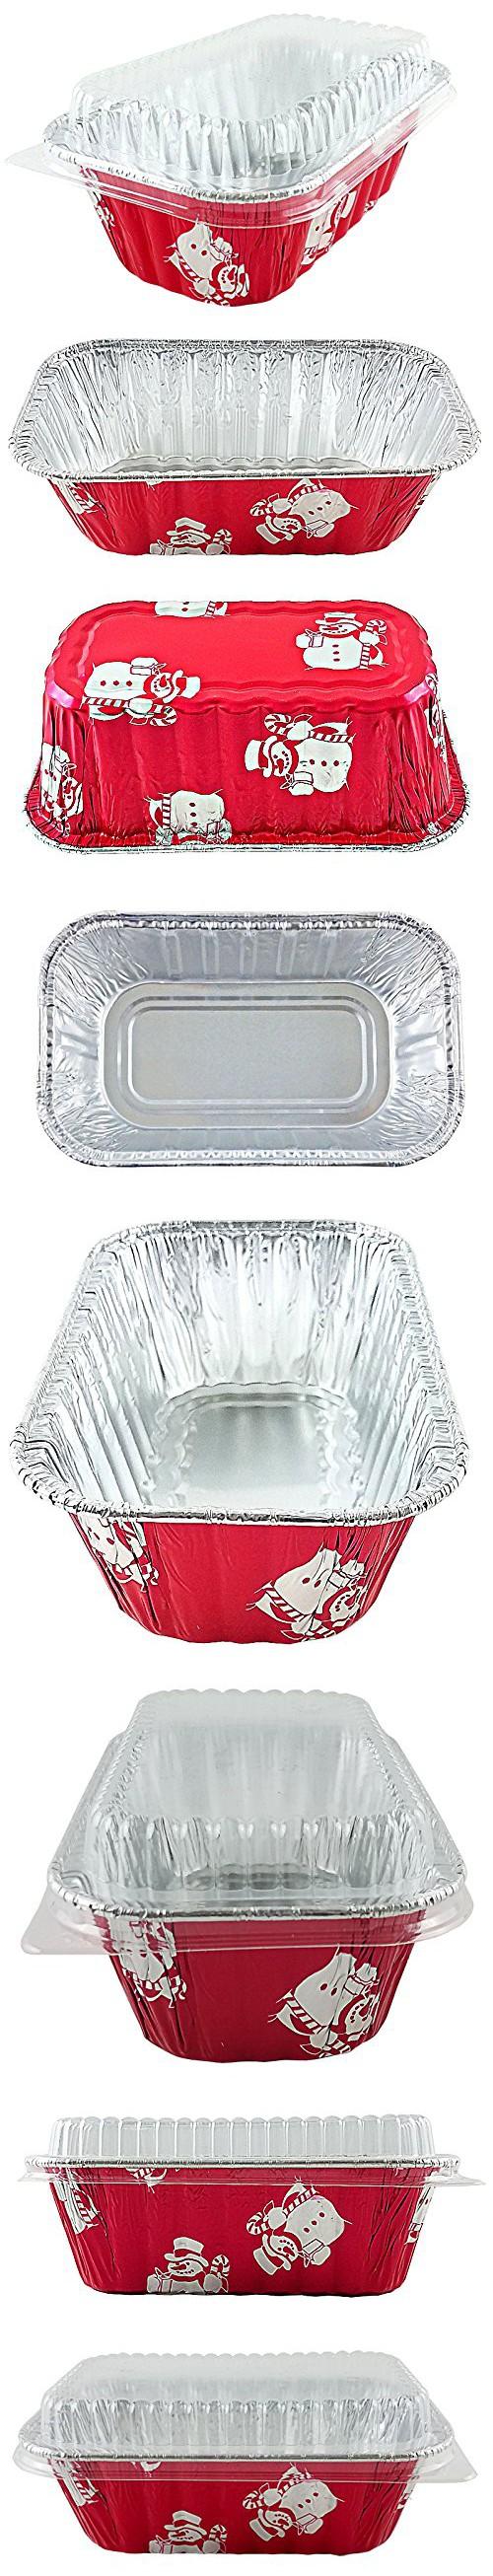 Handi Foil 1 Lb Red Aluminum Foil Mini Loaf Bread Holiday Baking